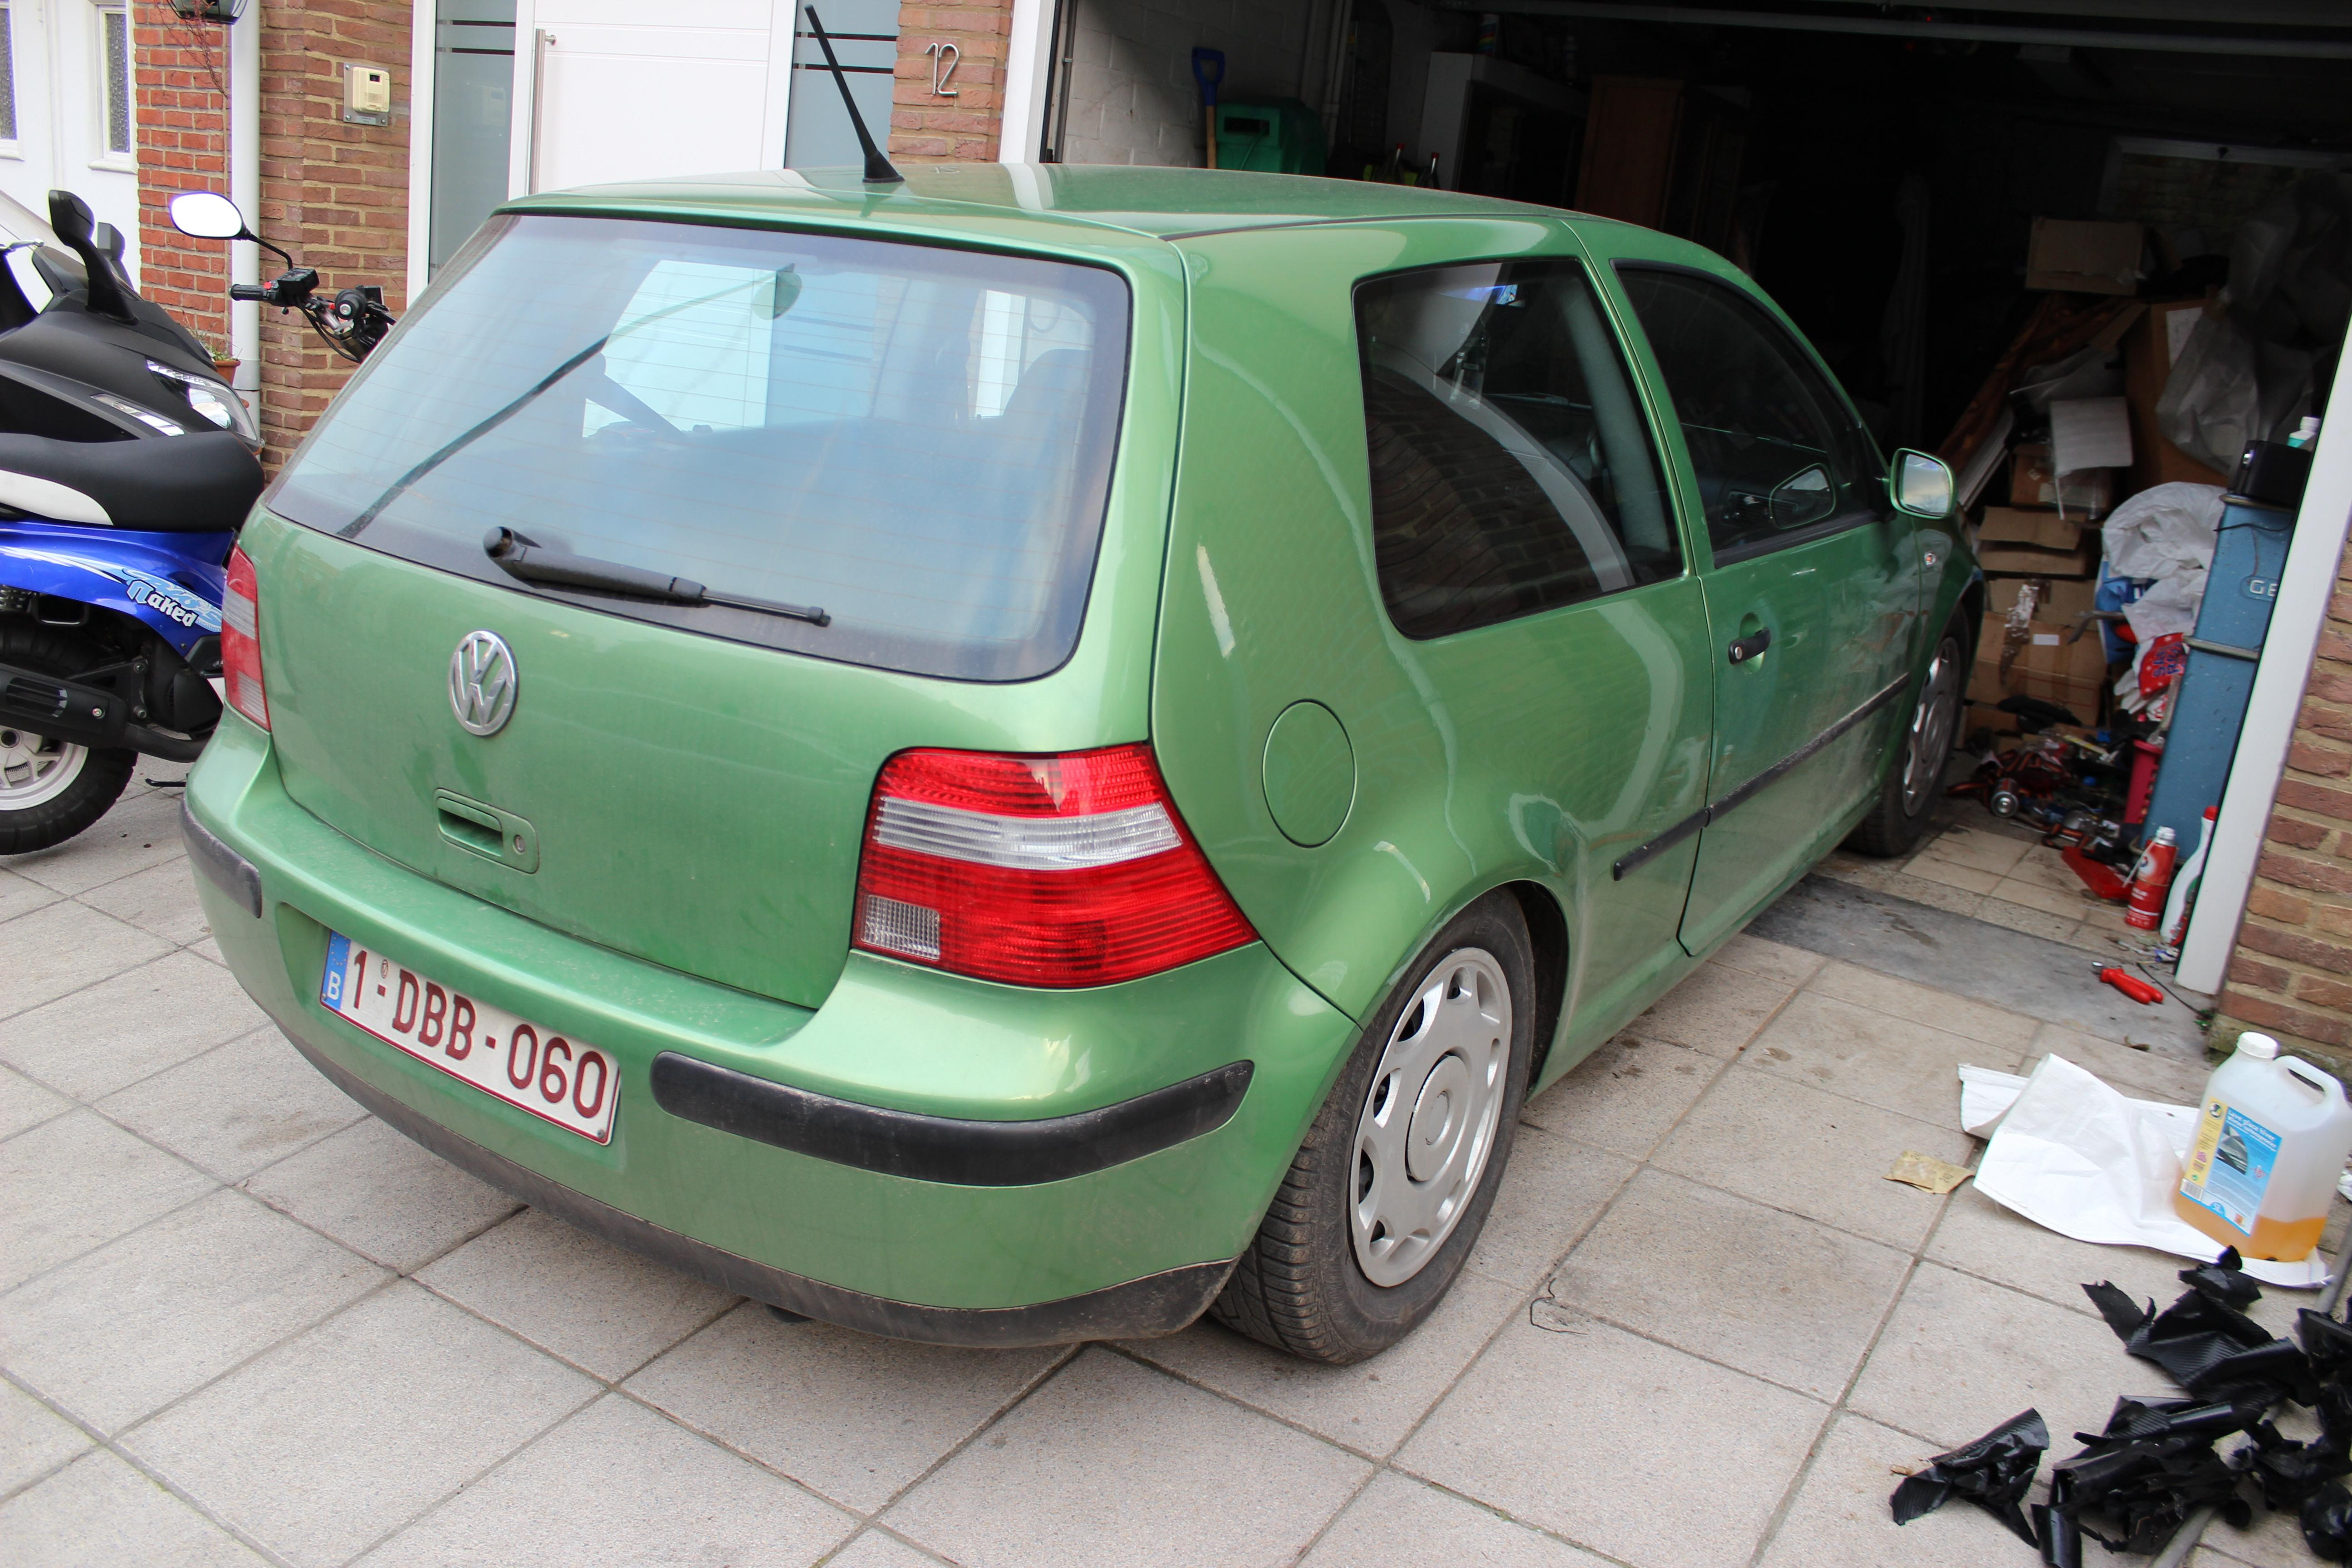 Golf iv 90 basis cosmic 98 be sinistr garage for Garage volkswagen paris 13